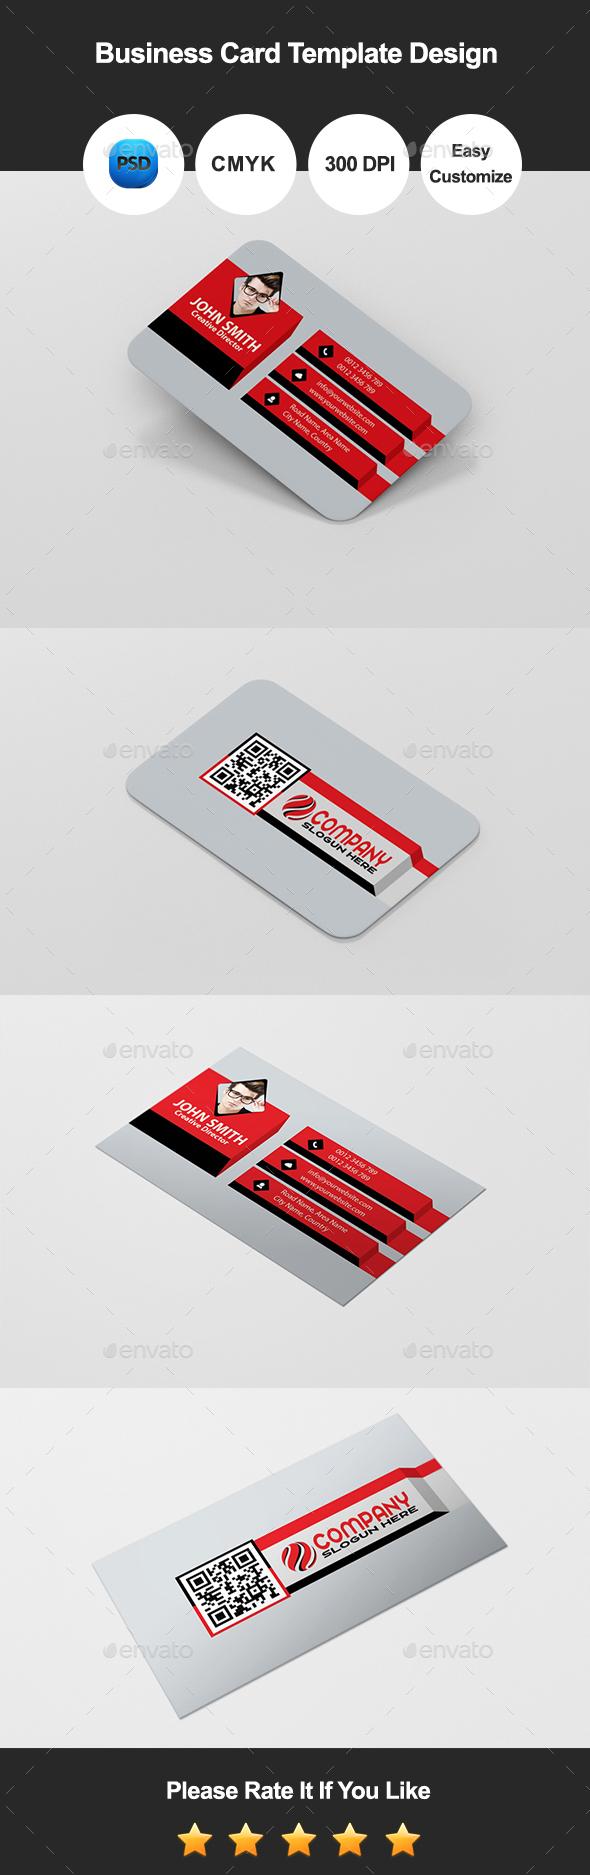 Redtrola Creative Business Card Template Design - Creative Business Cards